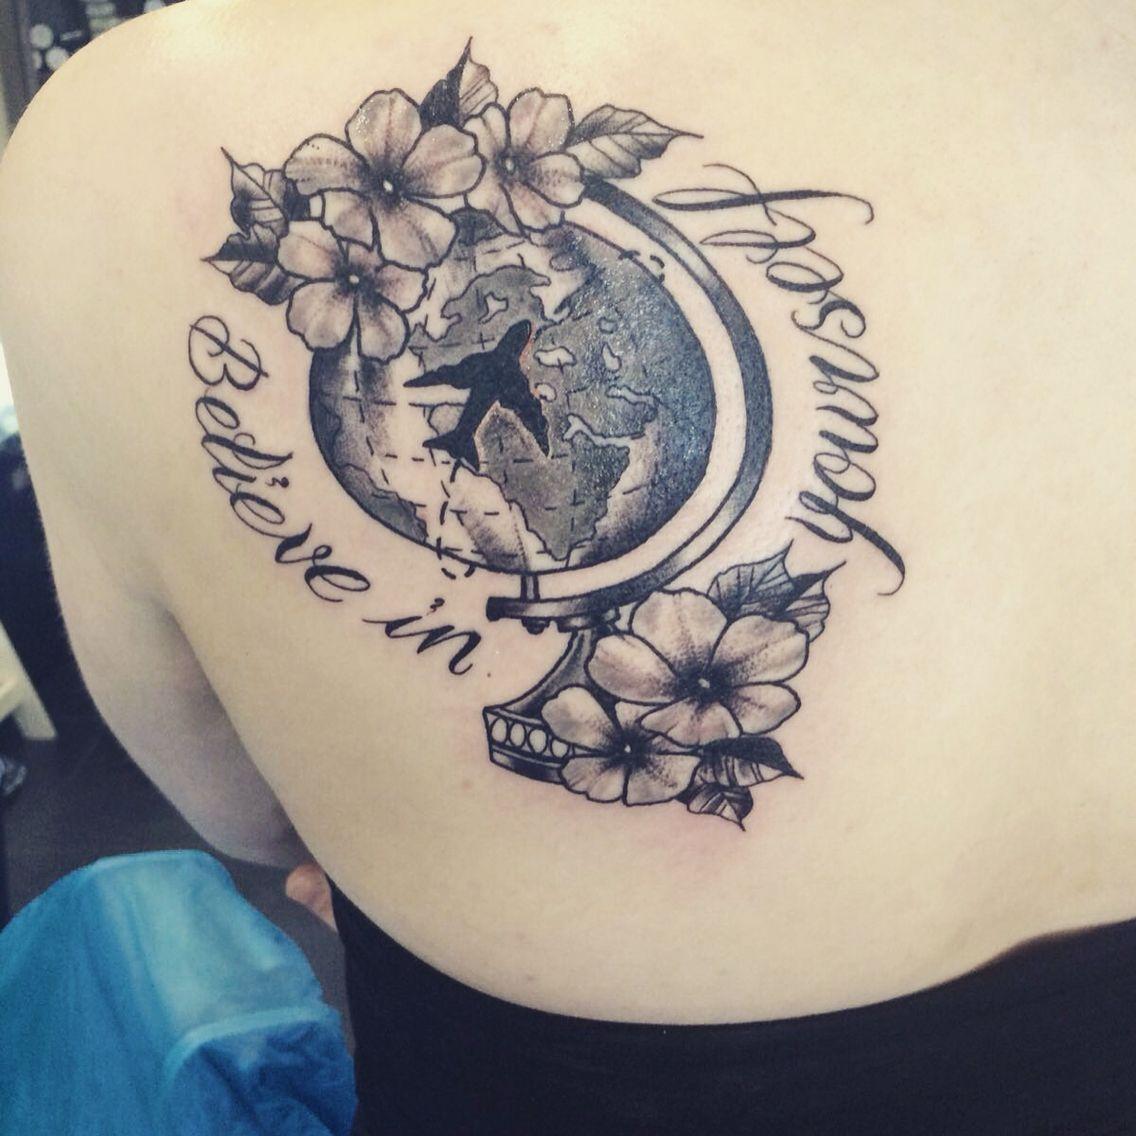 Tattoo travel inked believeinyourself globe cute traditional style i dig tattoos - Tatouage globe terrestre ...